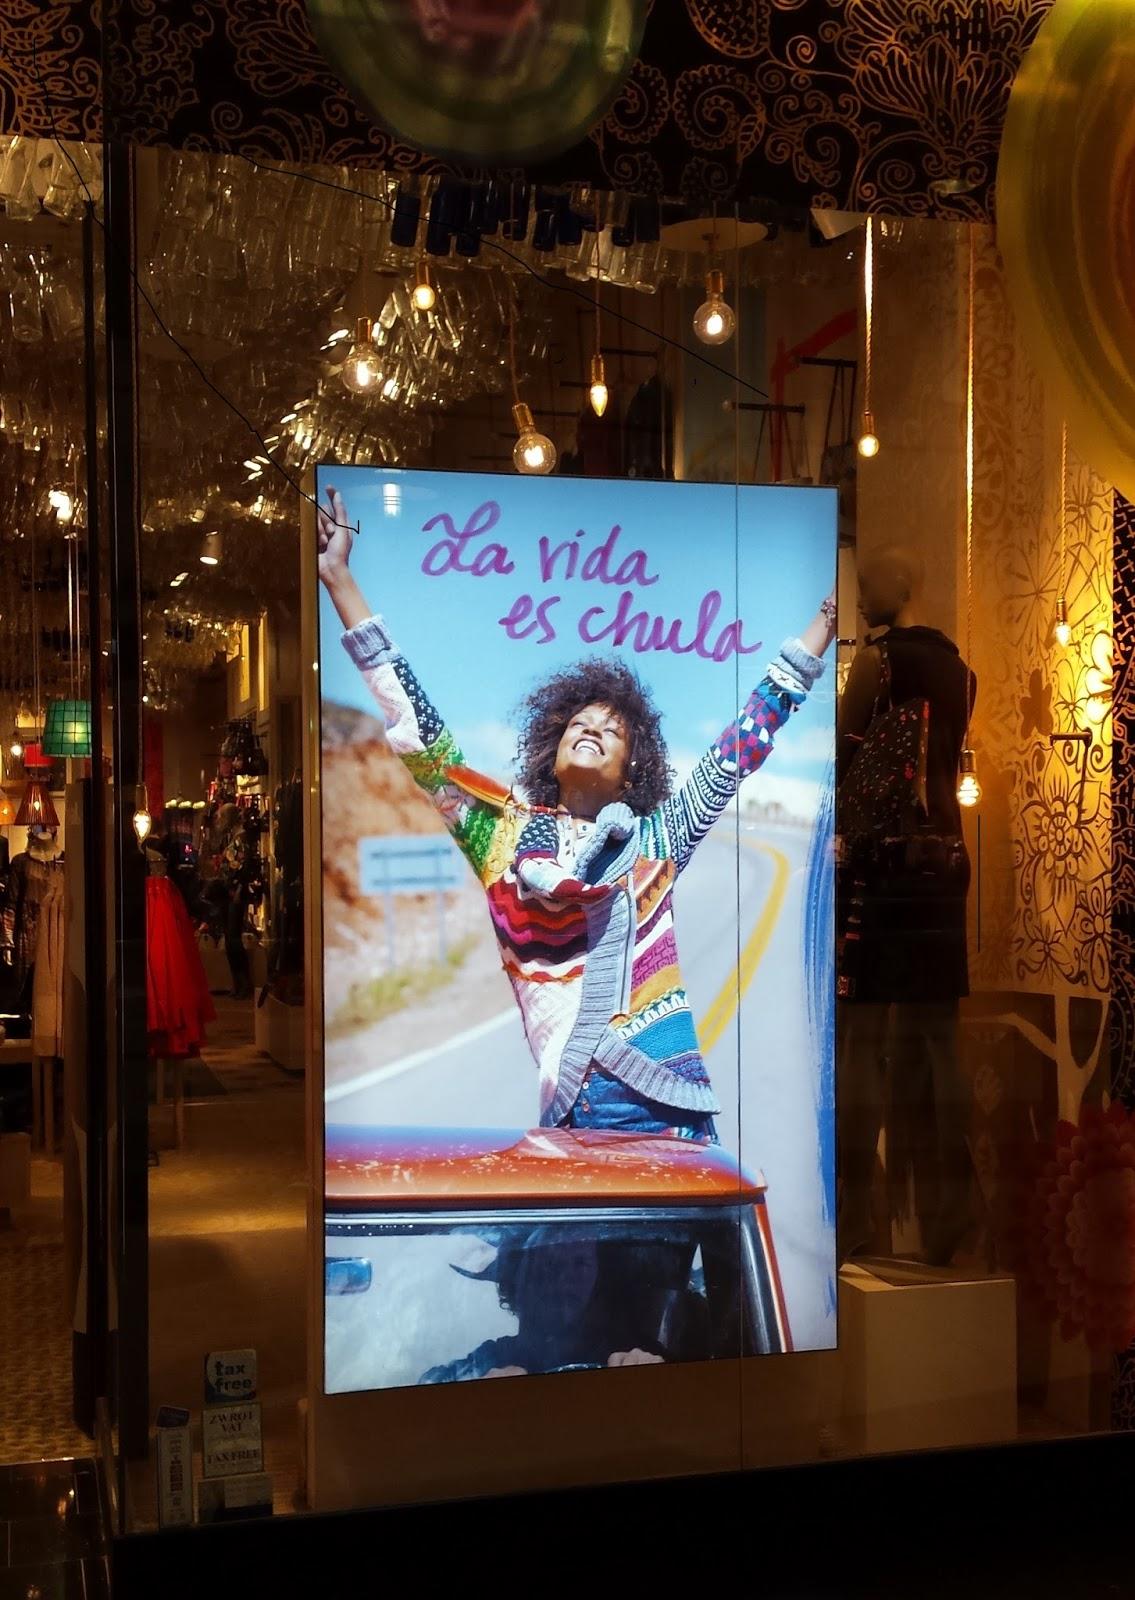 hiszpańska marka Desigual, moda hiszpańska w Polsce, blog o modzie hiszpańskiej, hiszpańskie marki